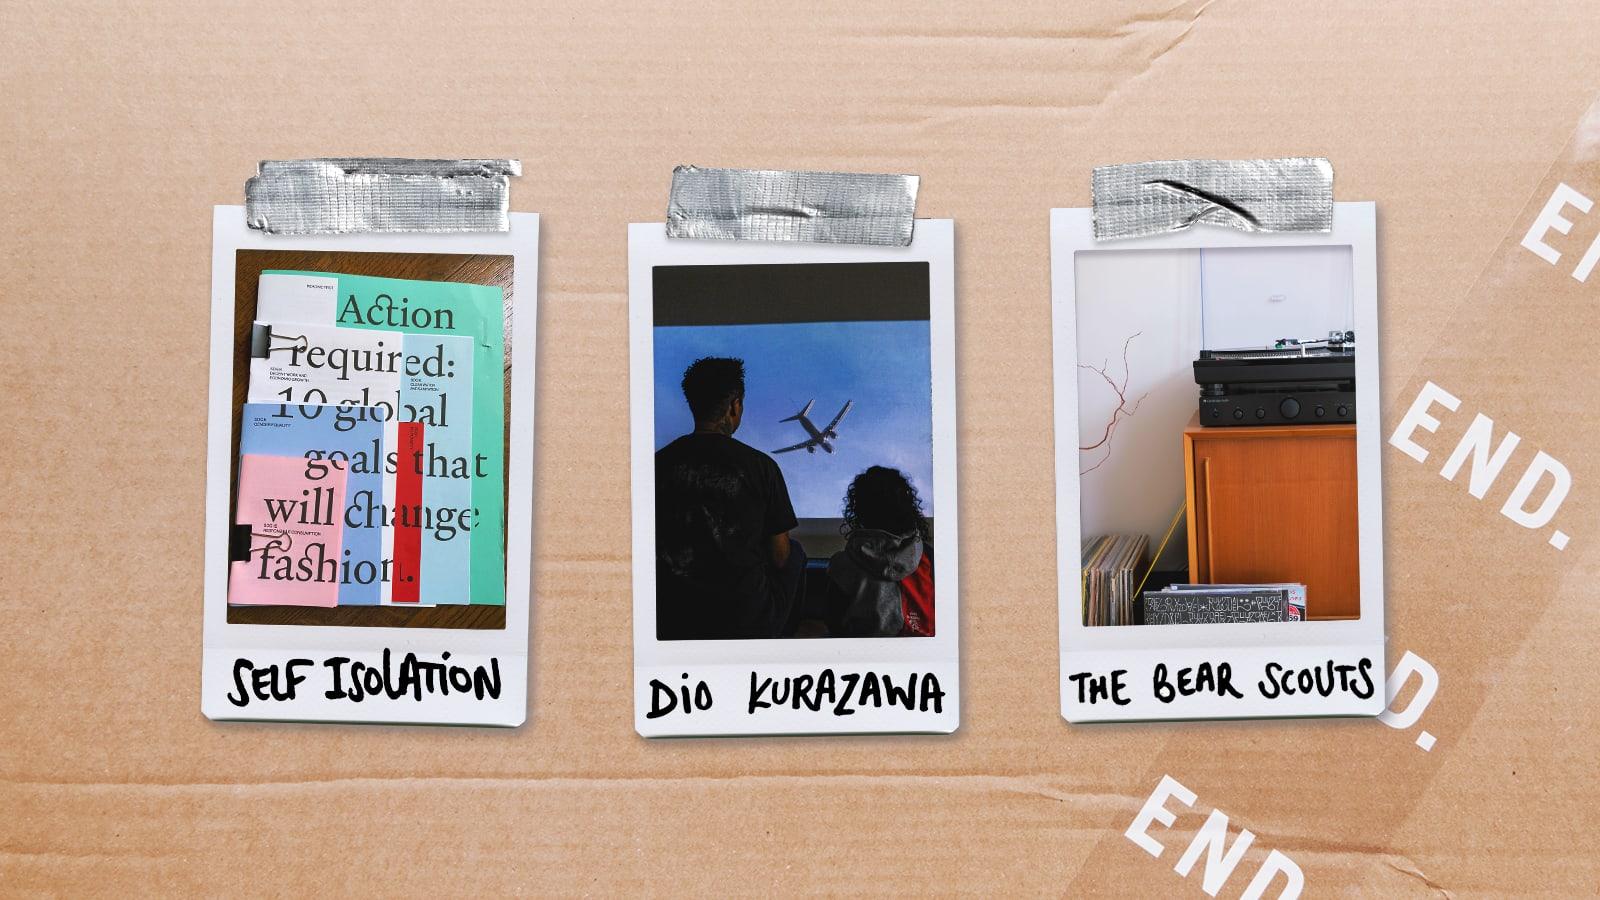 SELF ISOLATION .08 | Dio Kurazawa @ The Bear Scouts